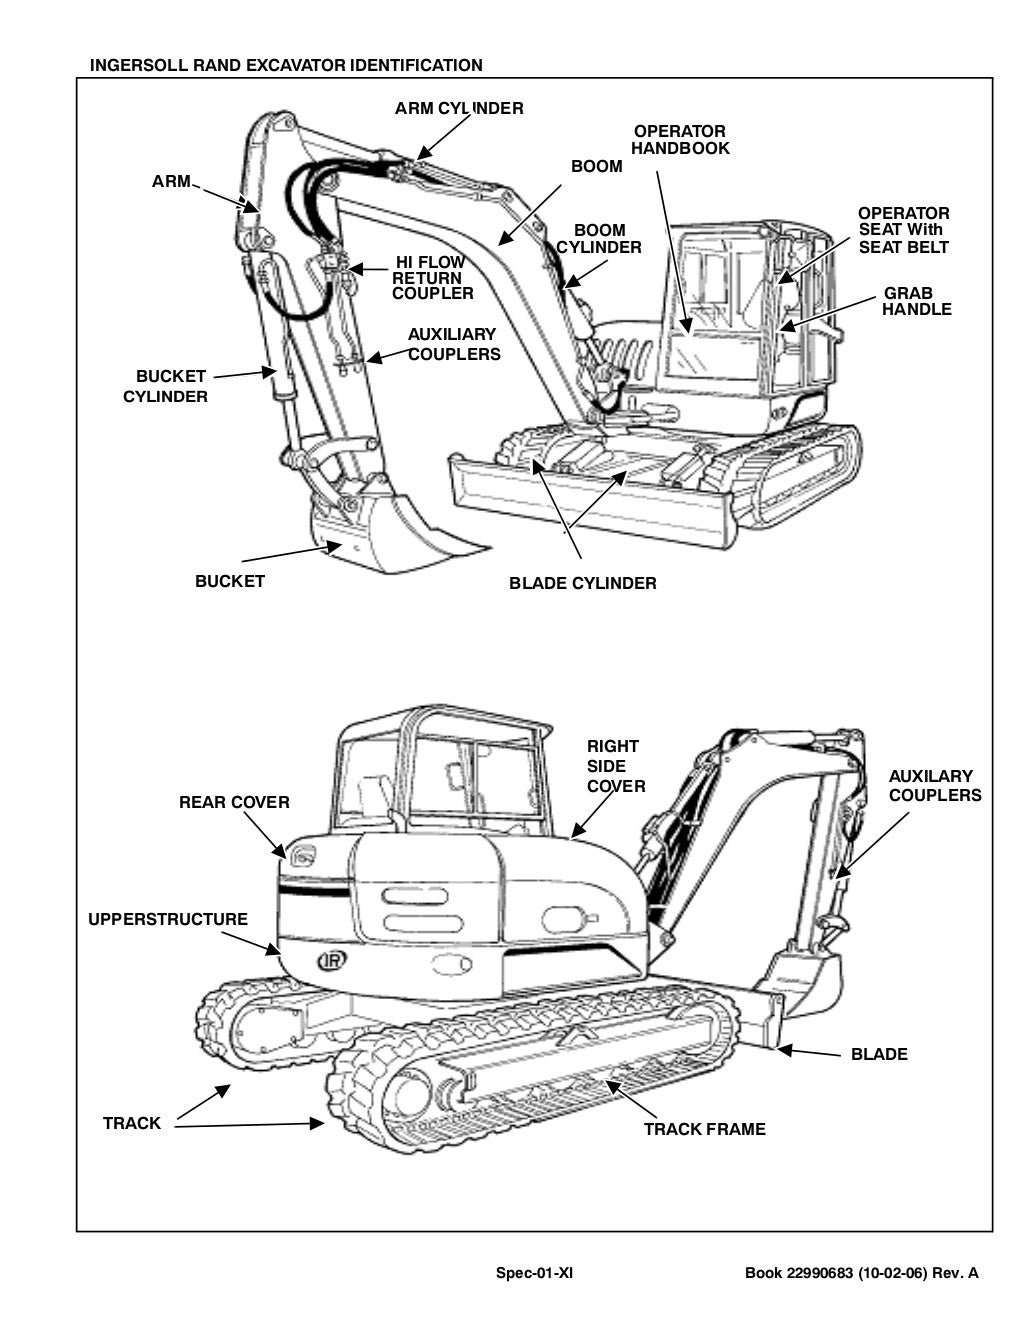 Bobcat Ingersoll Rand ZX75 Excavator Service Repair Manual